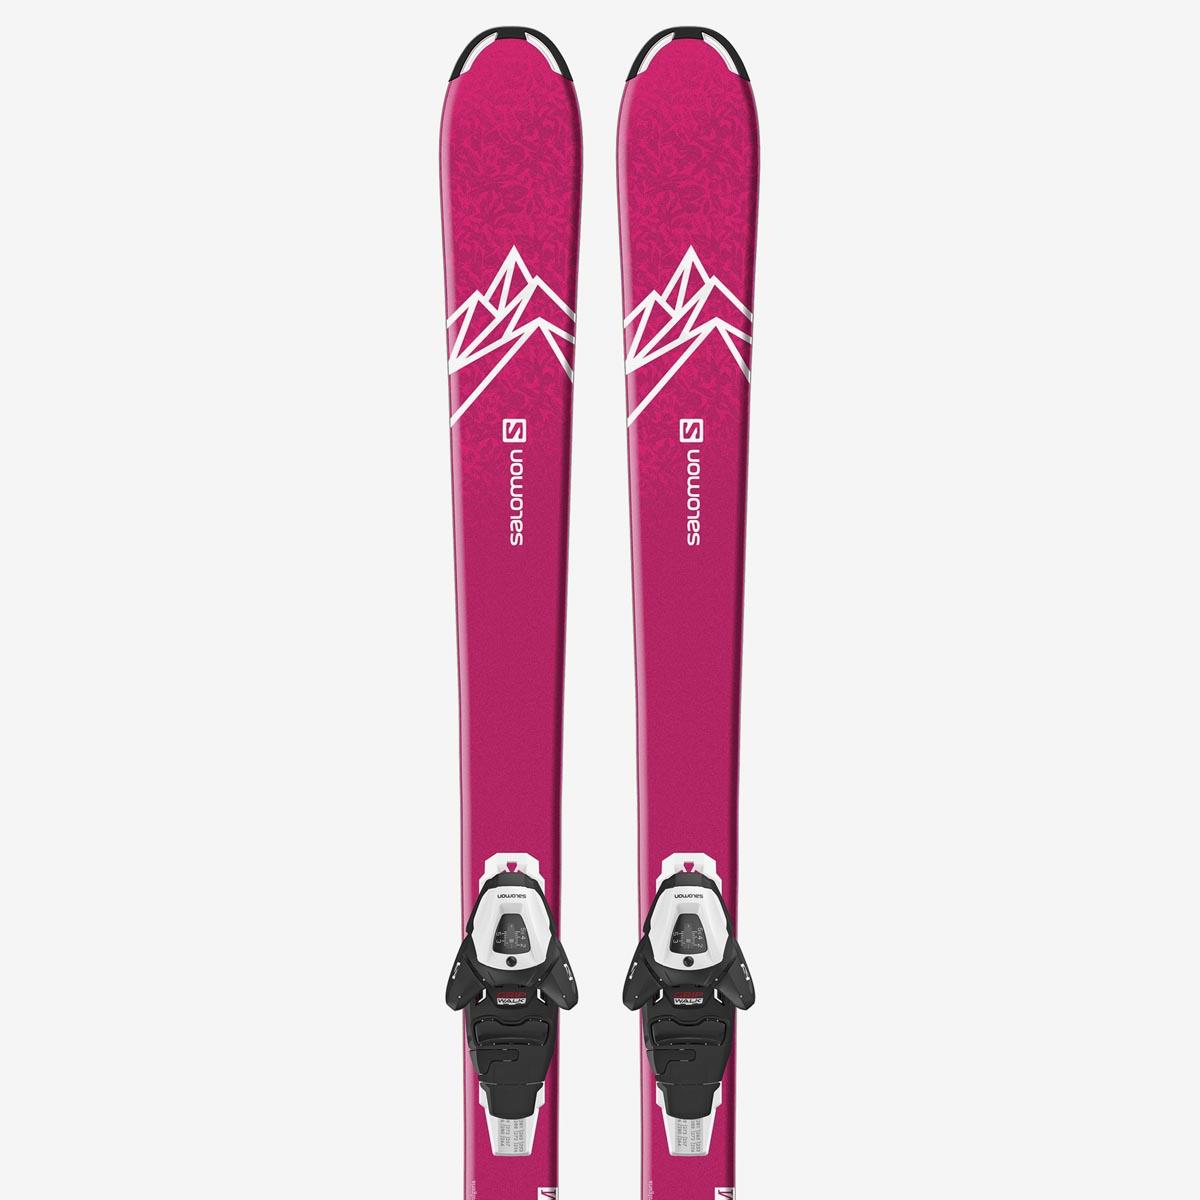 Комплект: лыжи + крепления QST LUX JR M + L6 GW J2